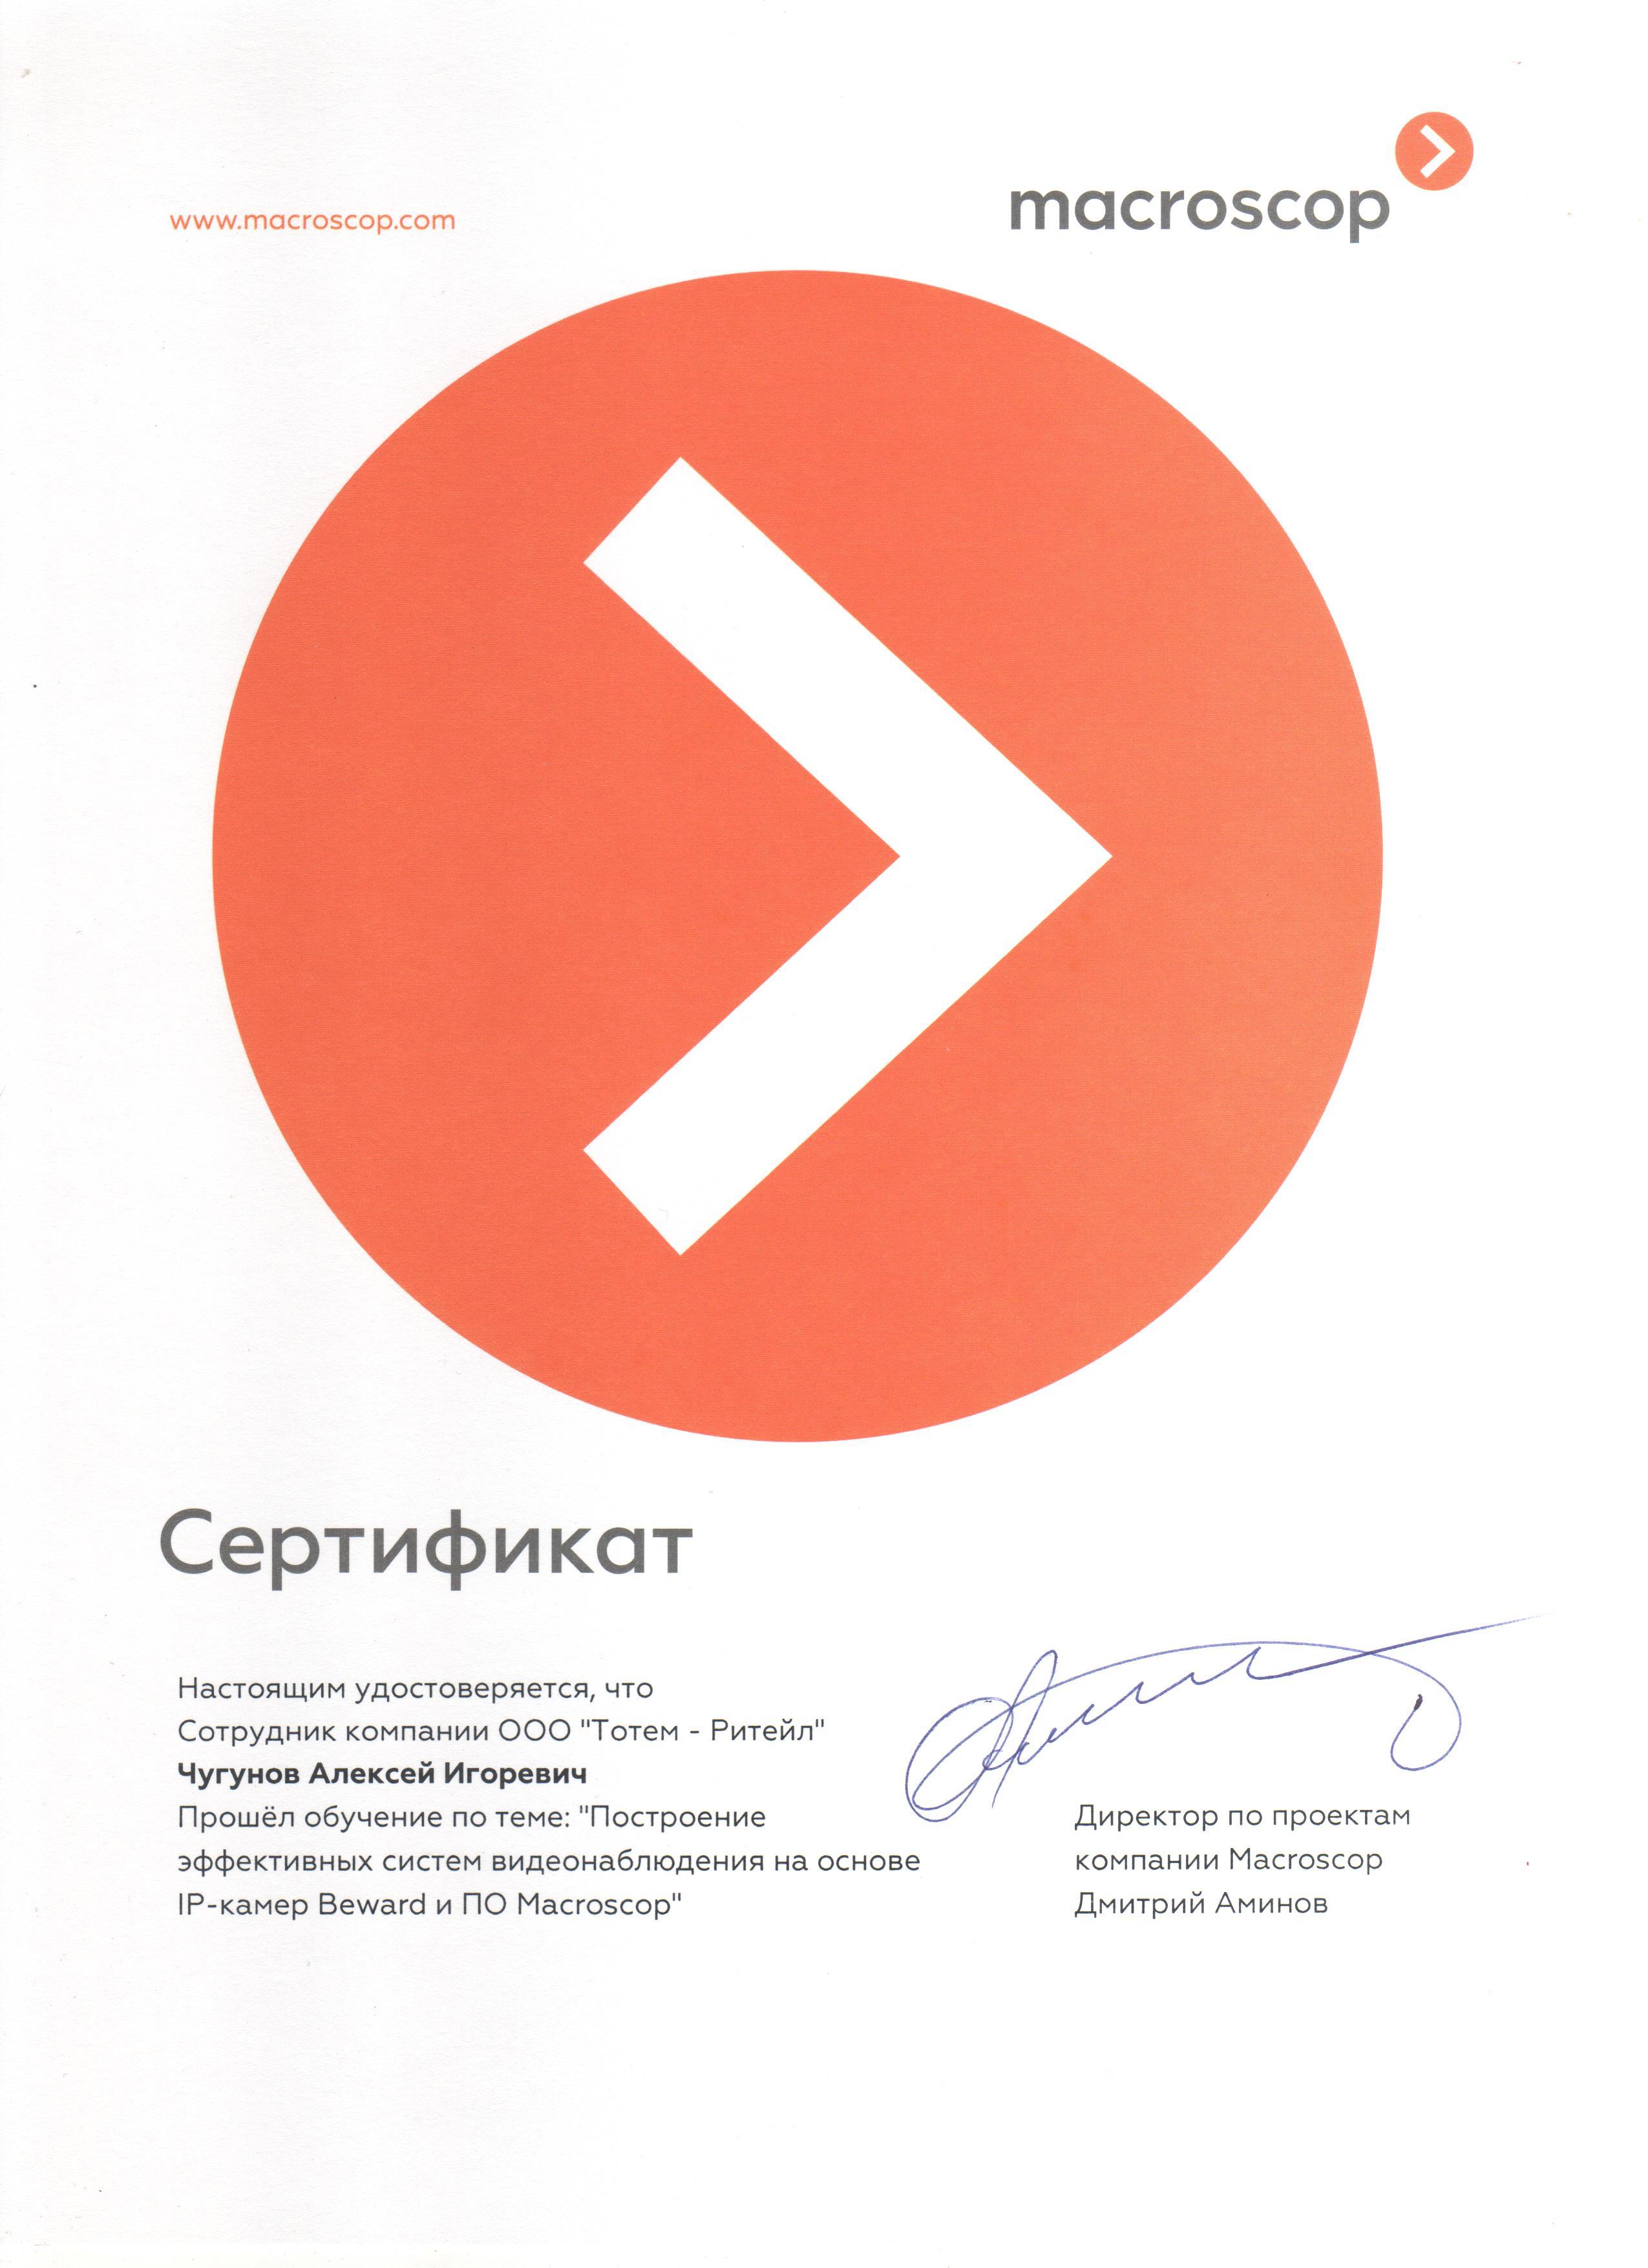 Сертификат_Macroscop_Чугунов_А.И_001.jpg